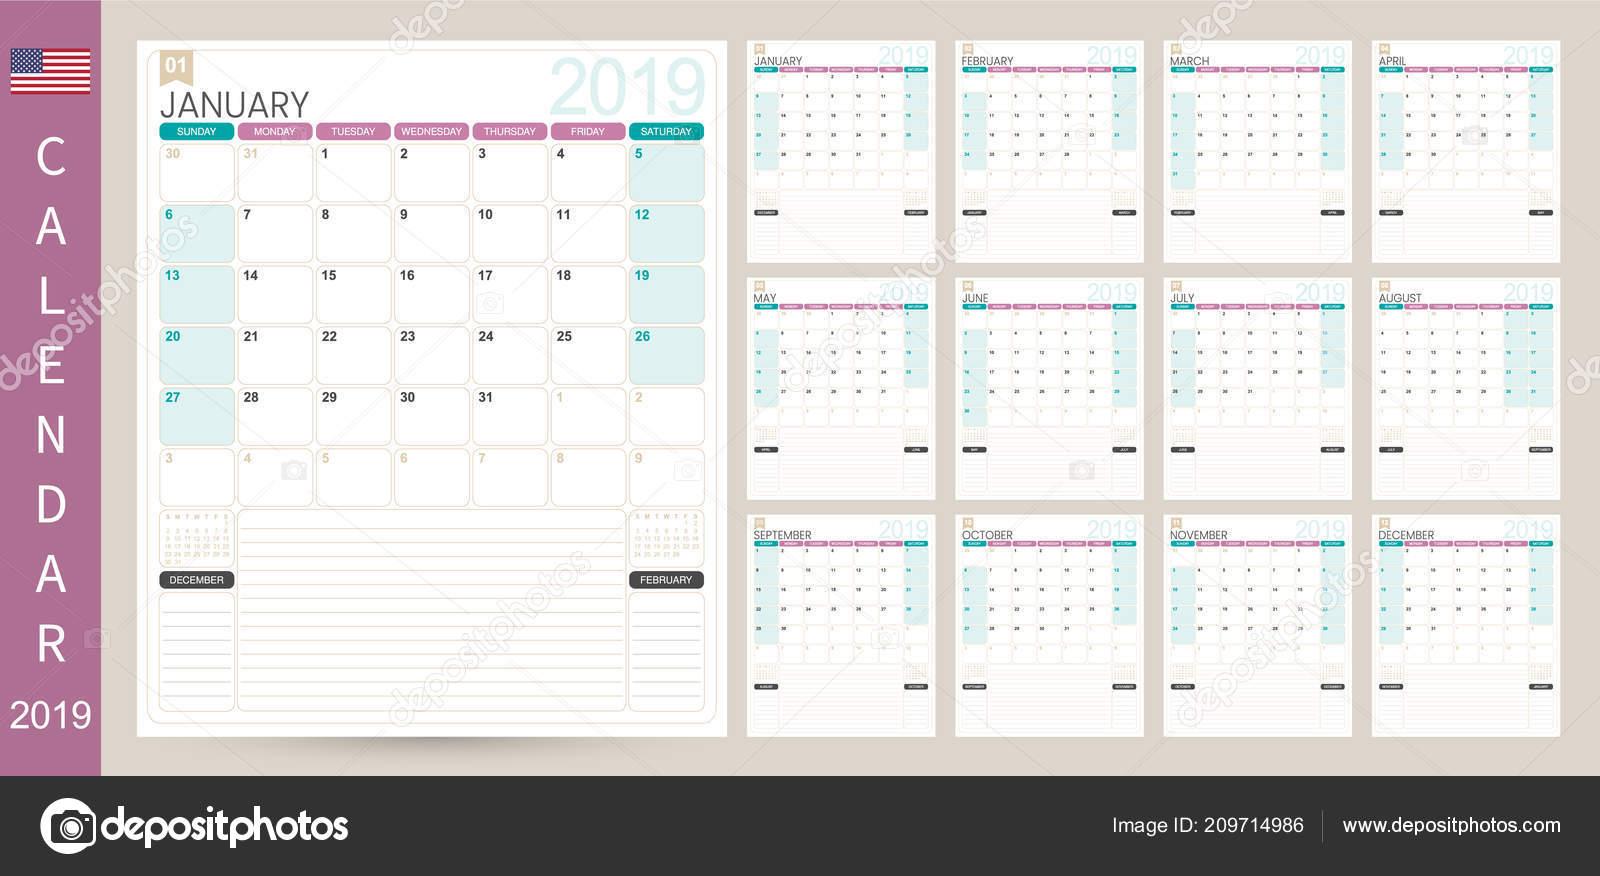 English Calendar Planner 2019 Week Starts Sunday Set Months January